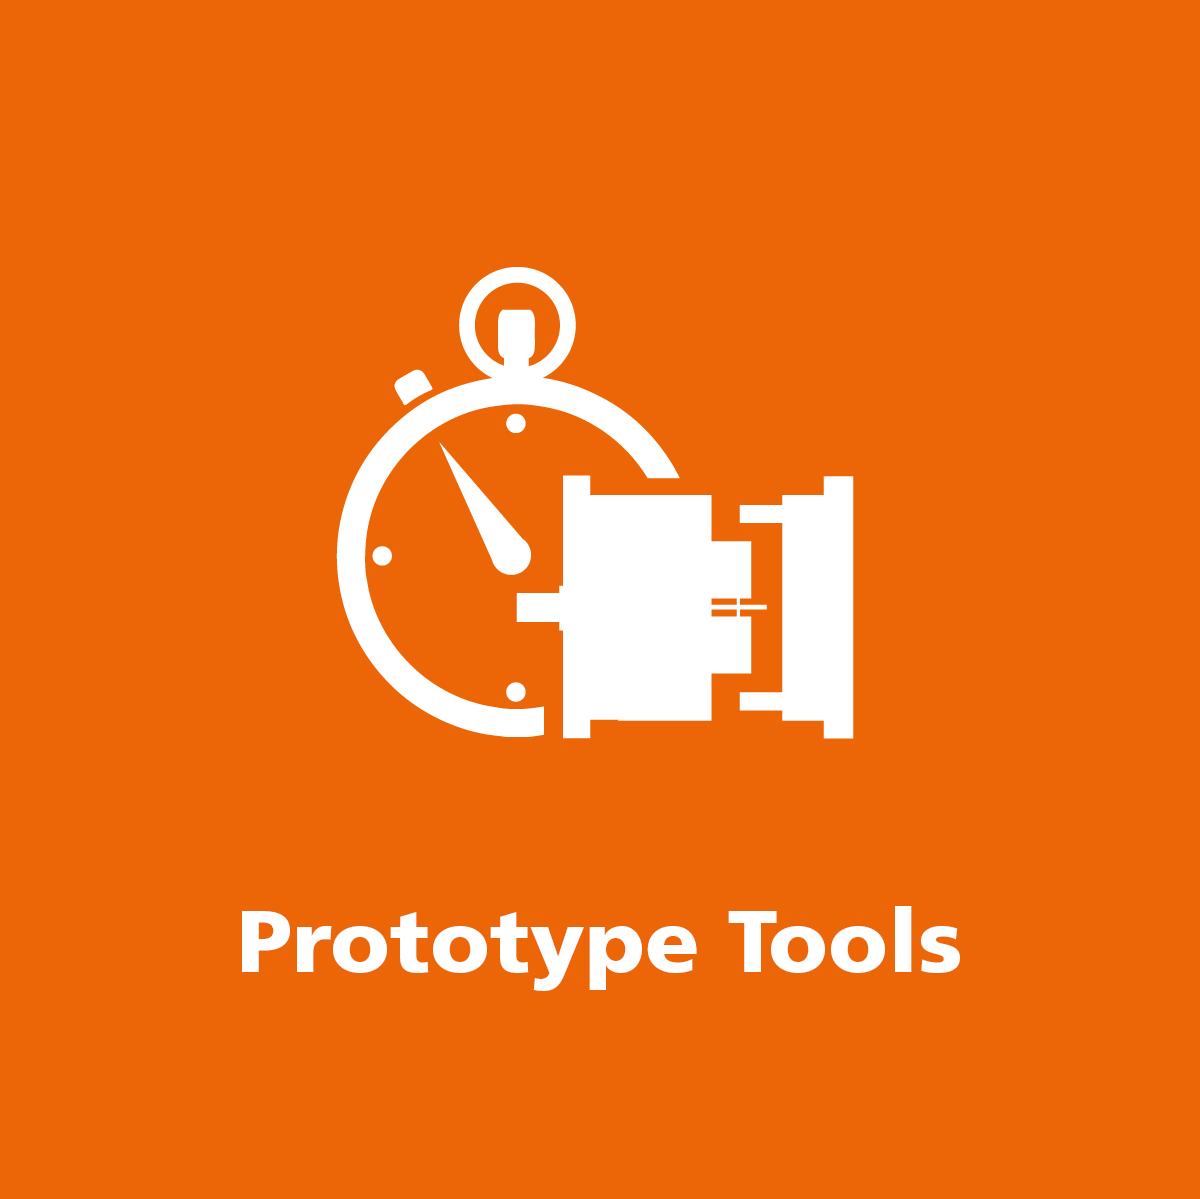 Prototypenwerkzeuge